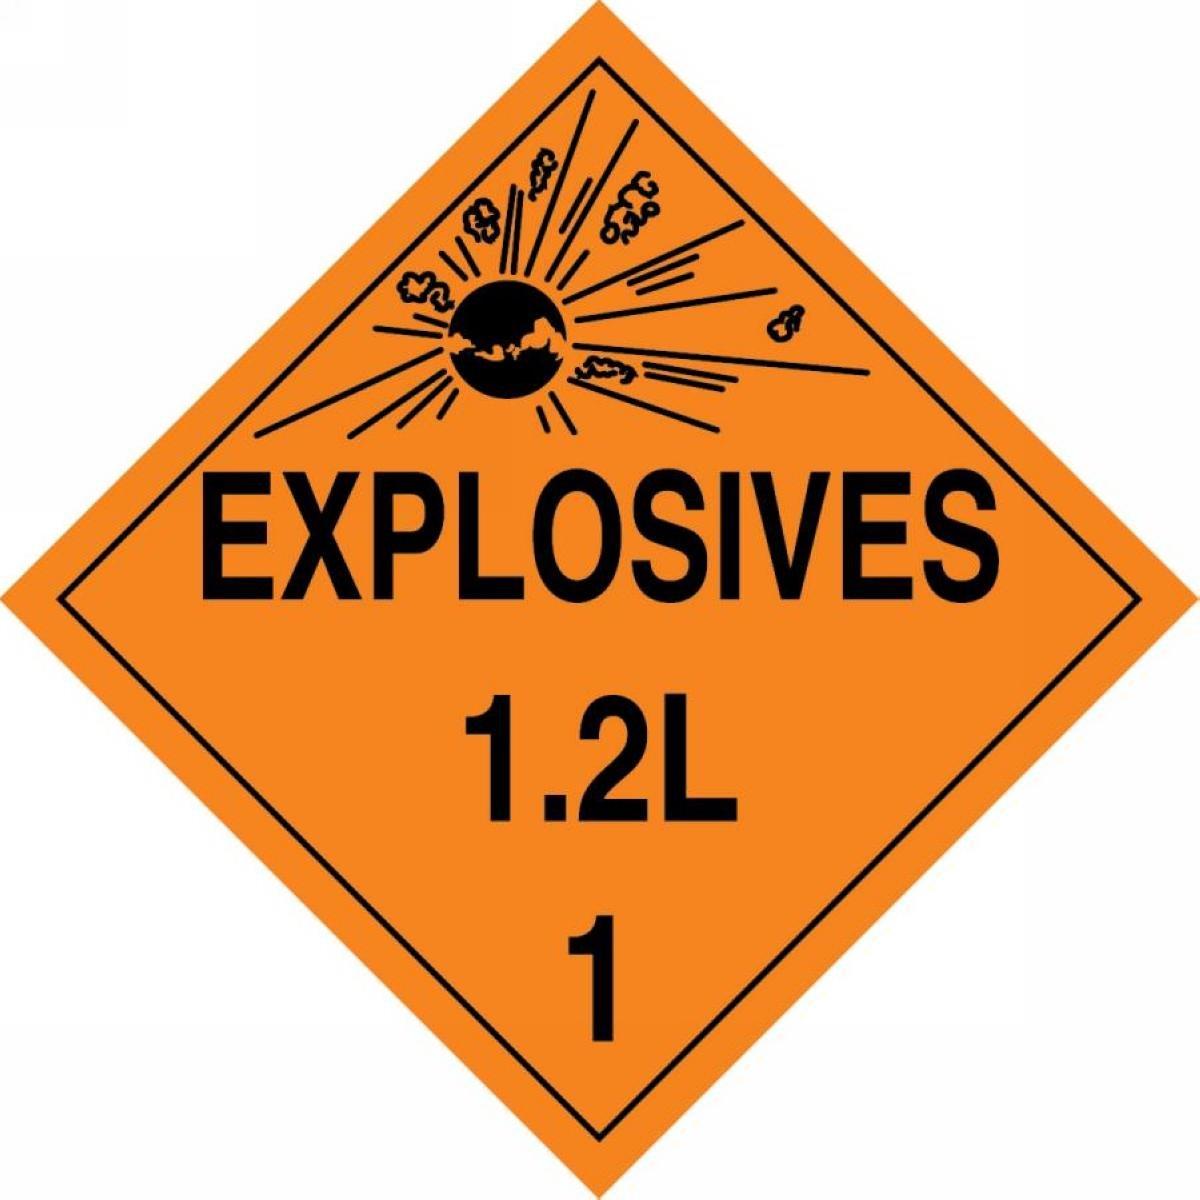 LegendEXPLOSIVES 1.2L 1 with Graphic Accuform MPL119VP100 Plastic Hazard Class 1//Division 2L DOT Placard 10-3//4 Width x 10-3//4 Length Pack of 100 Black on Orange